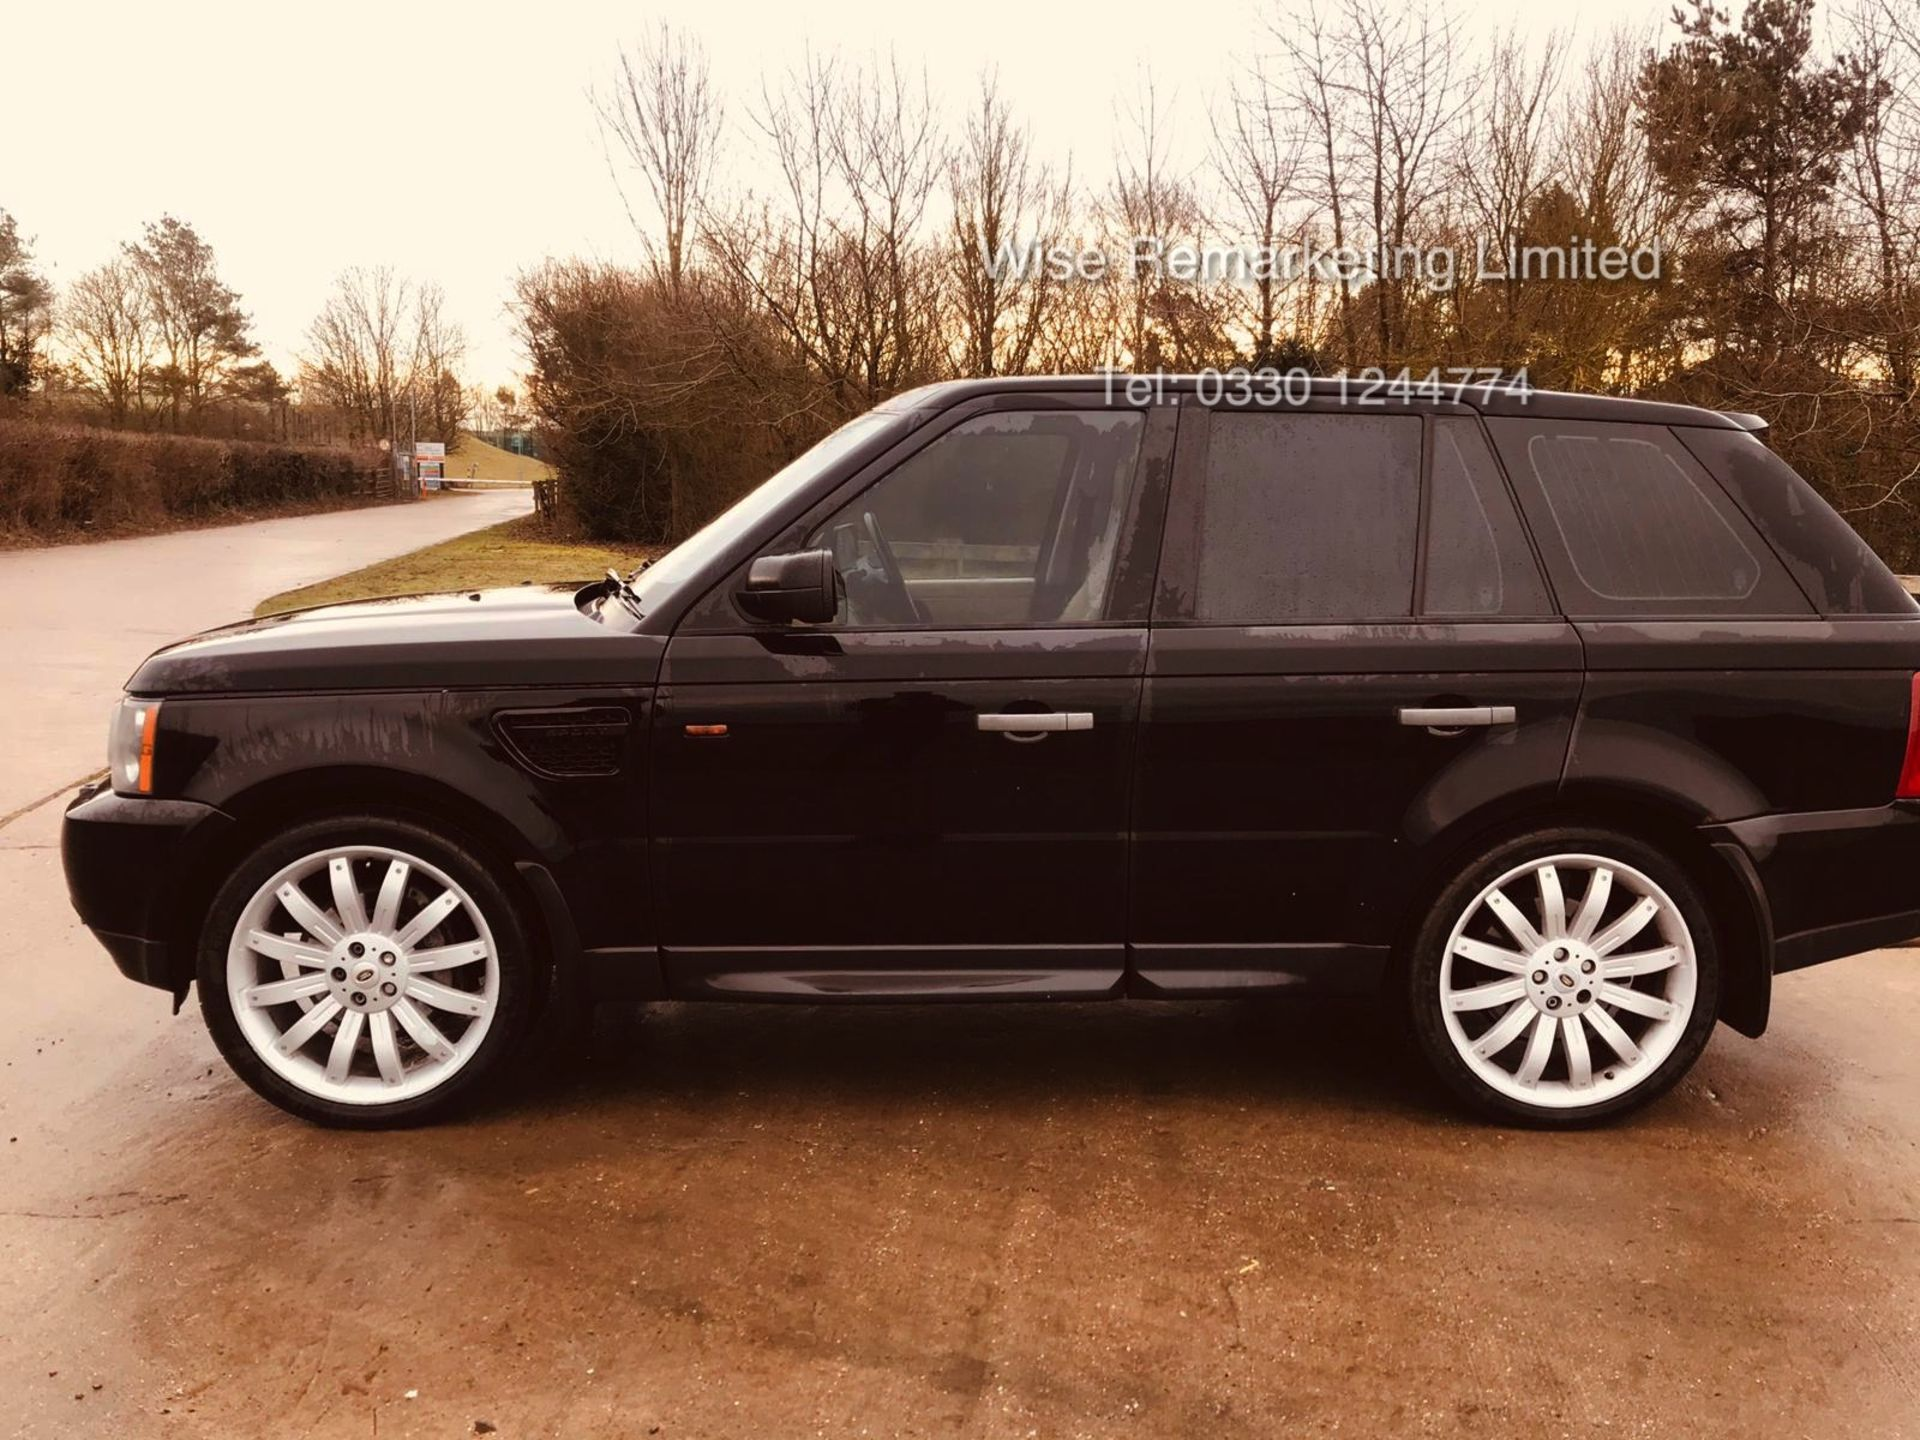 Range Rover Sport 2.7 TDV6 HSE Auto - 2008 Model - Cream Leather - Sat Nav - Heated Seats - Image 5 of 19